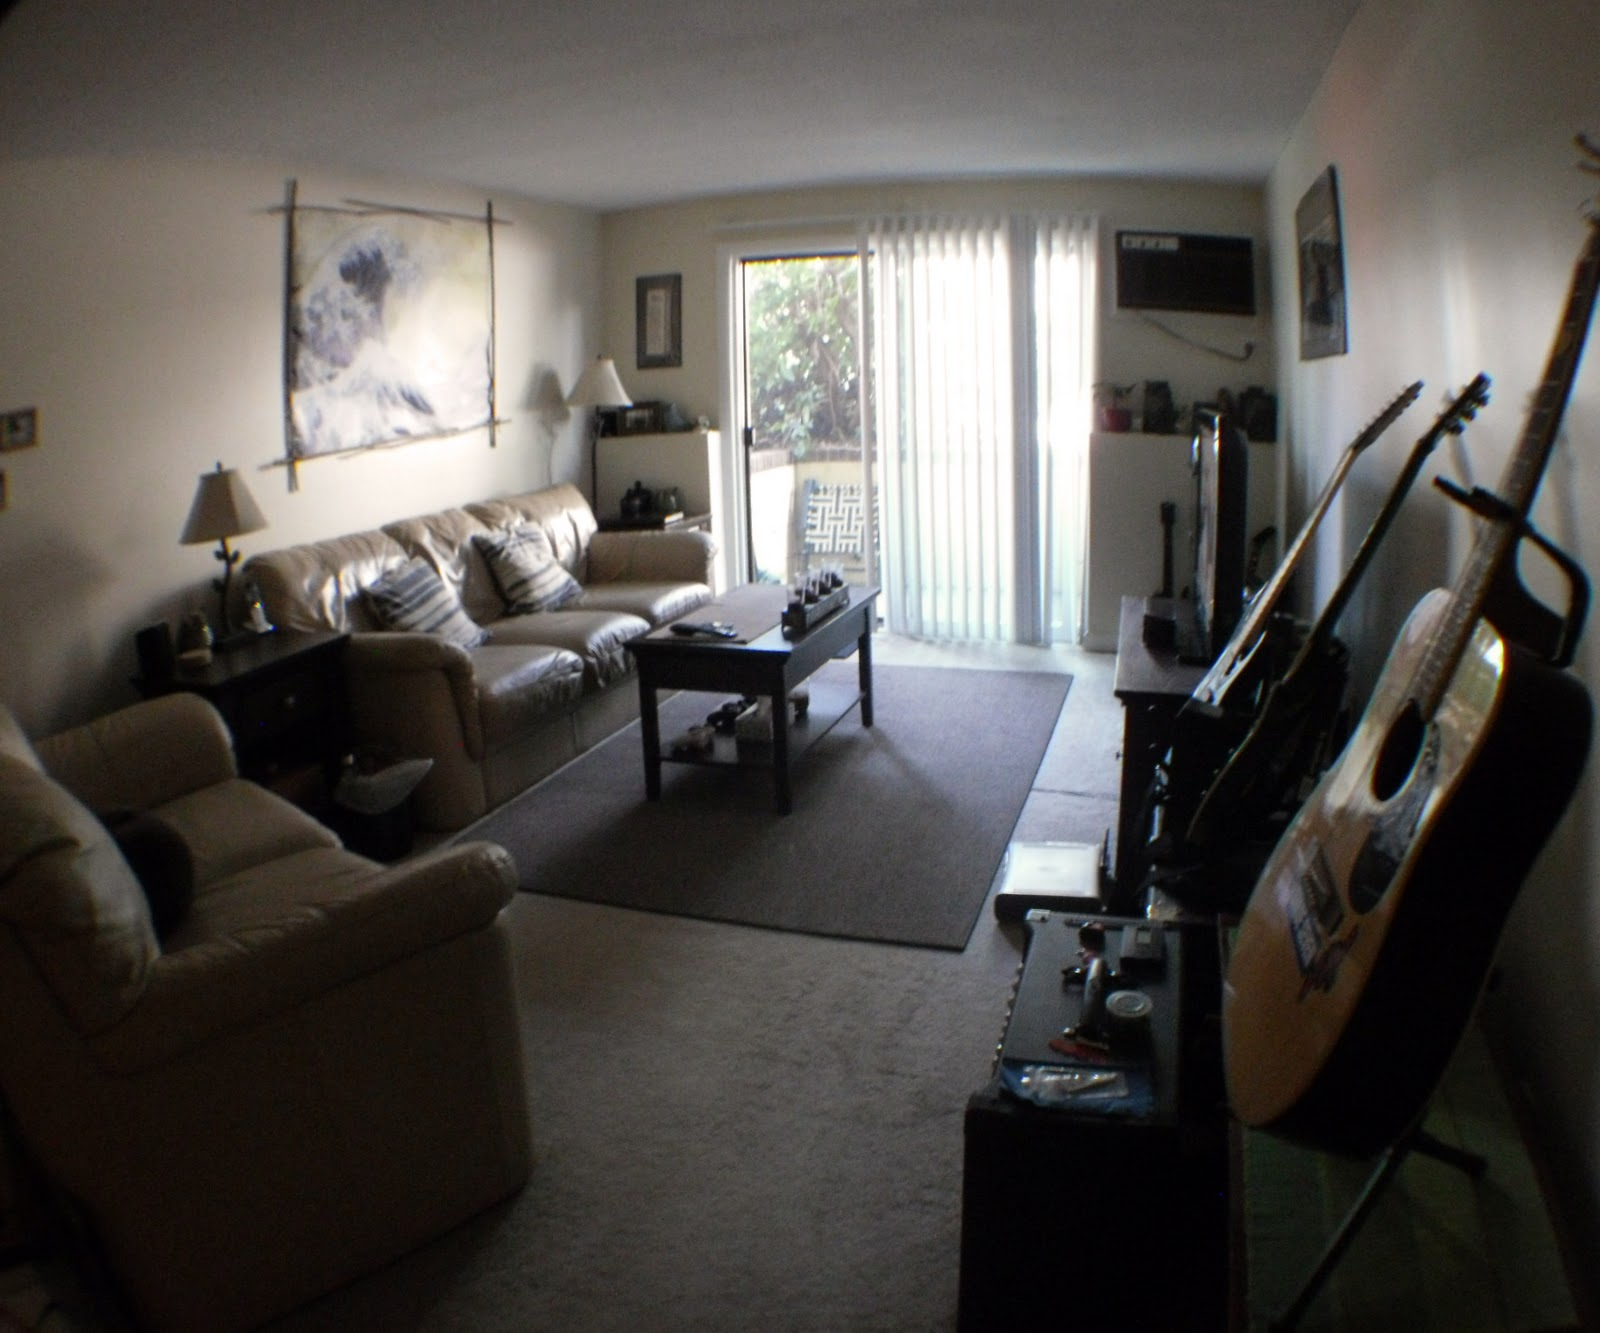 Vegging for health 102 apartment tour part iv living for Living room 102